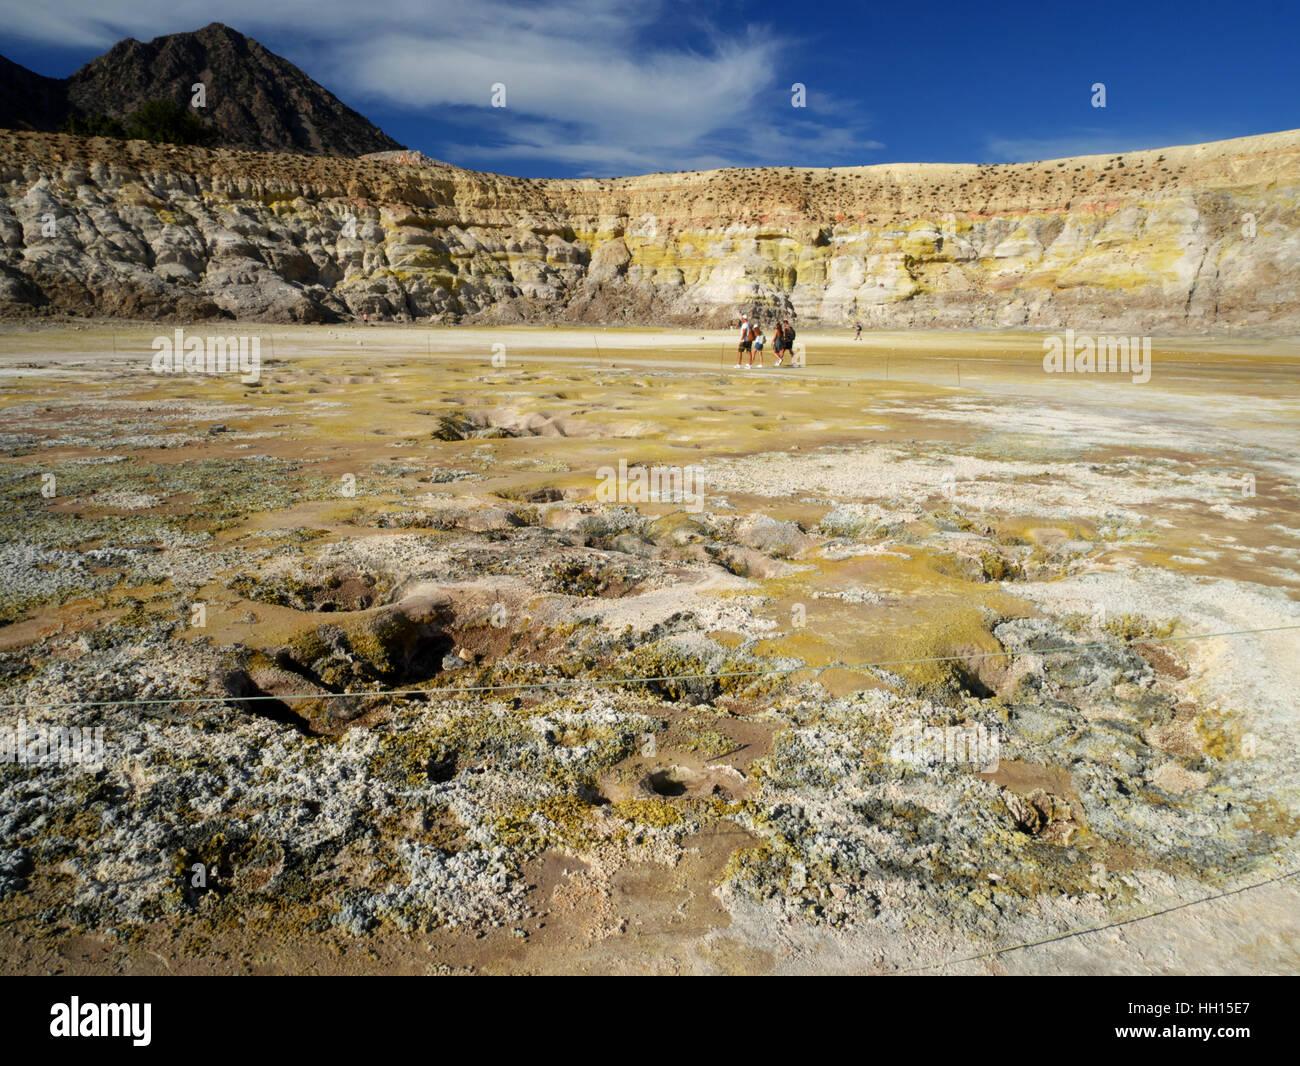 Fumaroles, Stefanos Crater, Lakki, Nysiros, Greece. - Stock Image